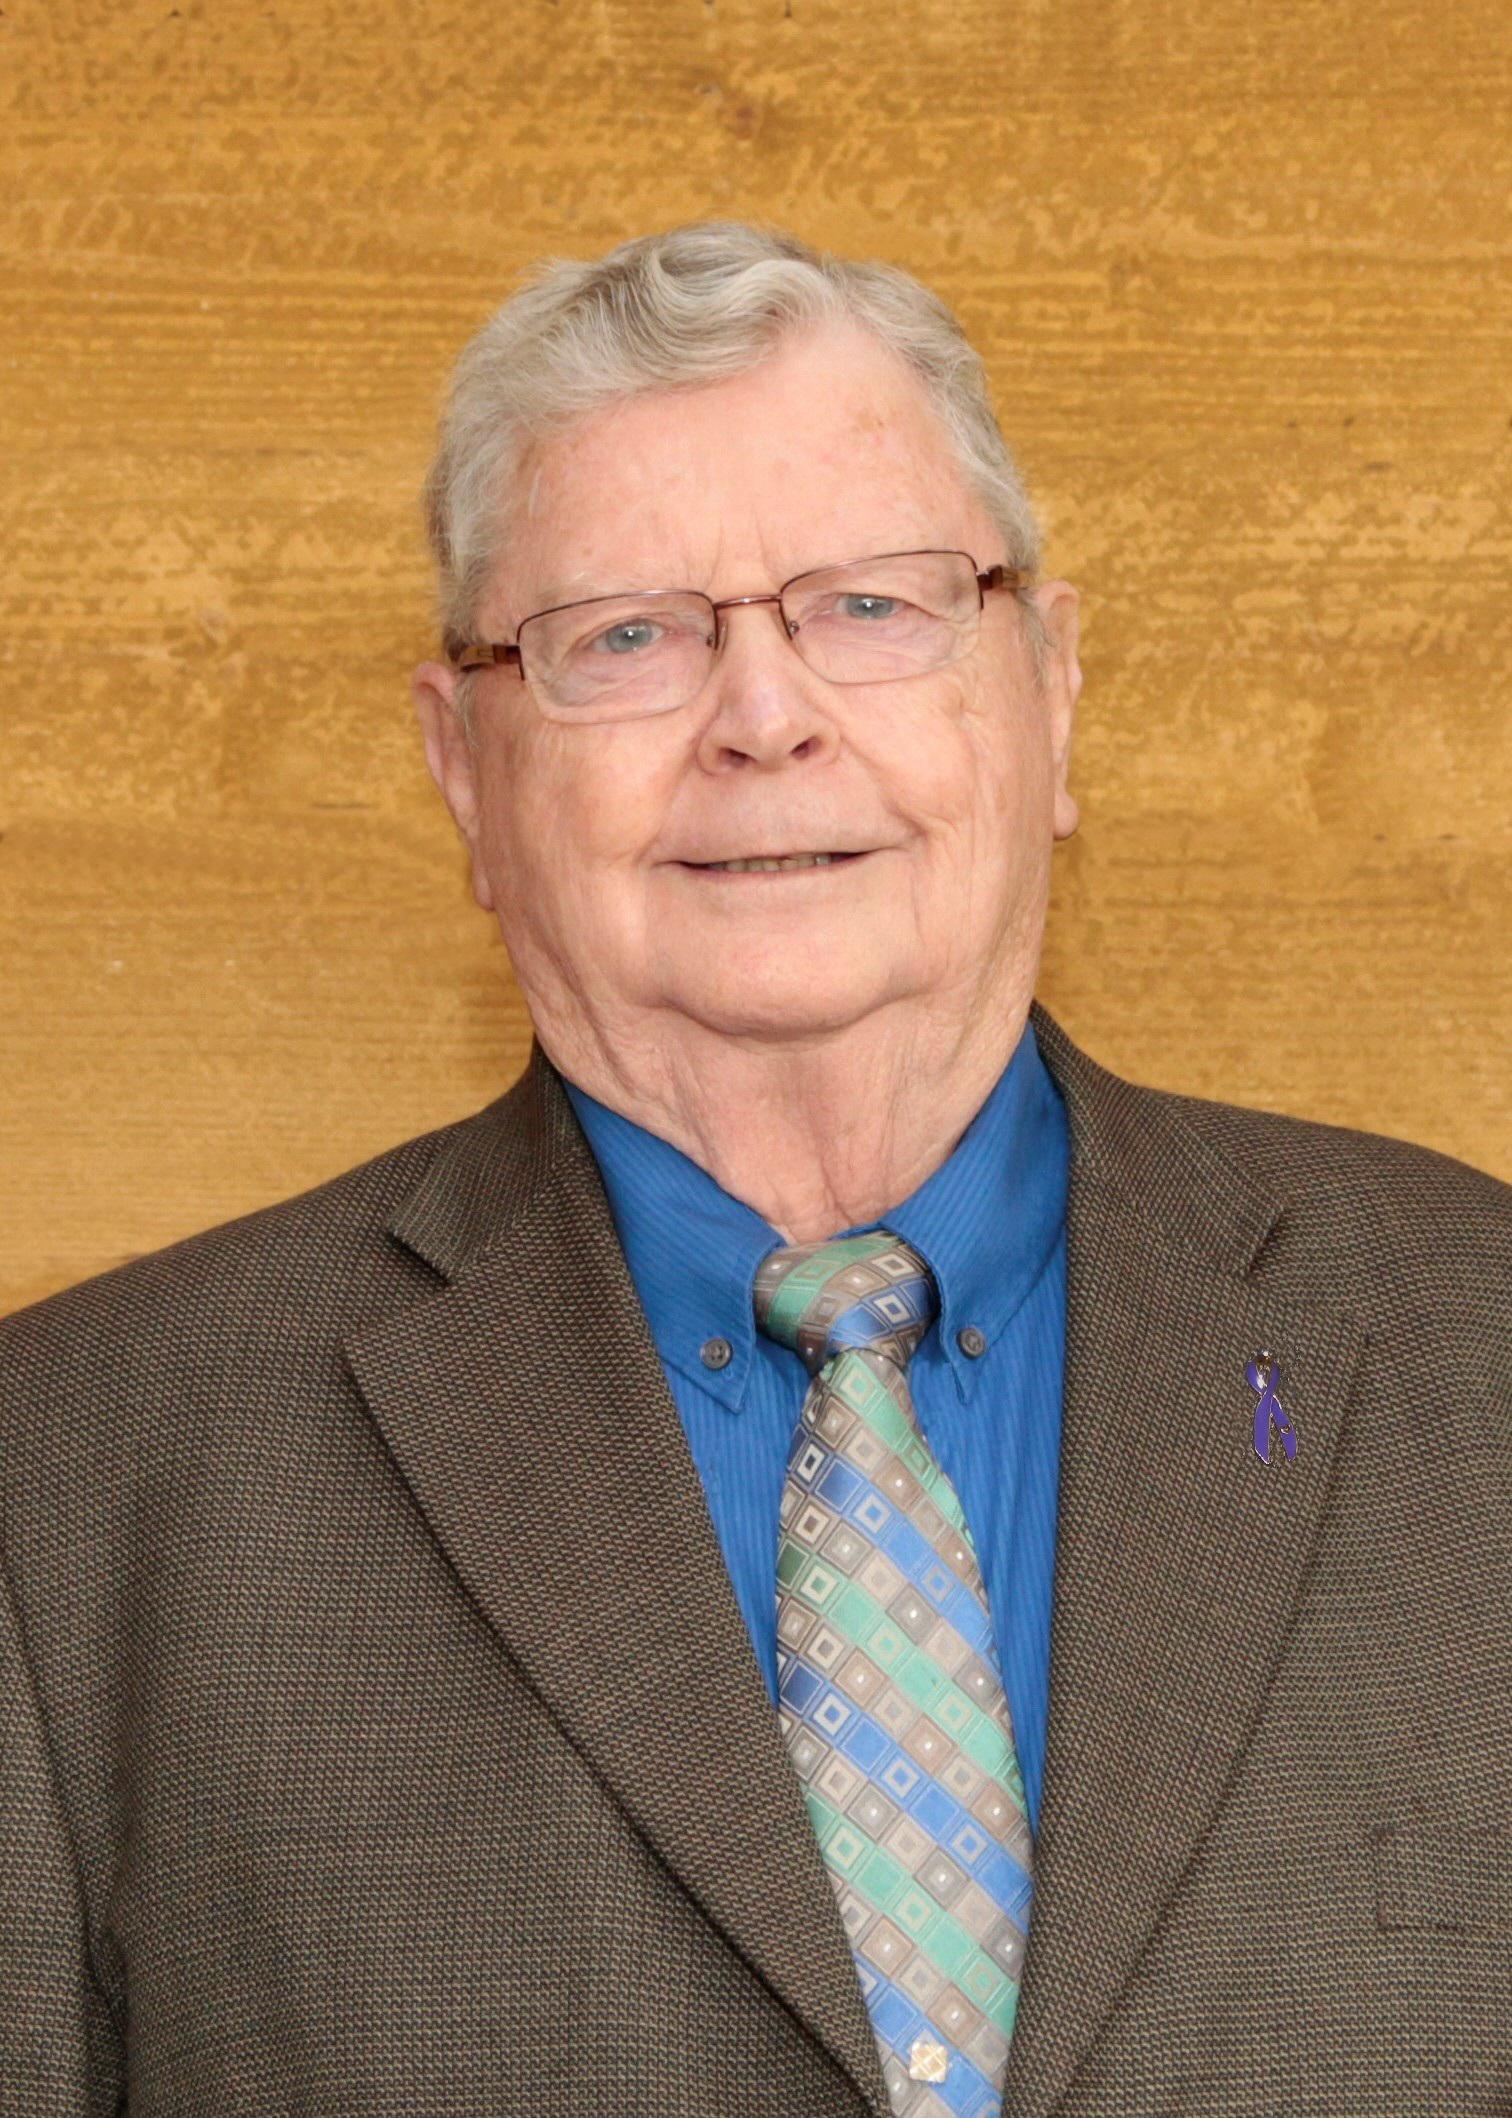 Jim Walton  Retired from Wycliffe Bible Translator